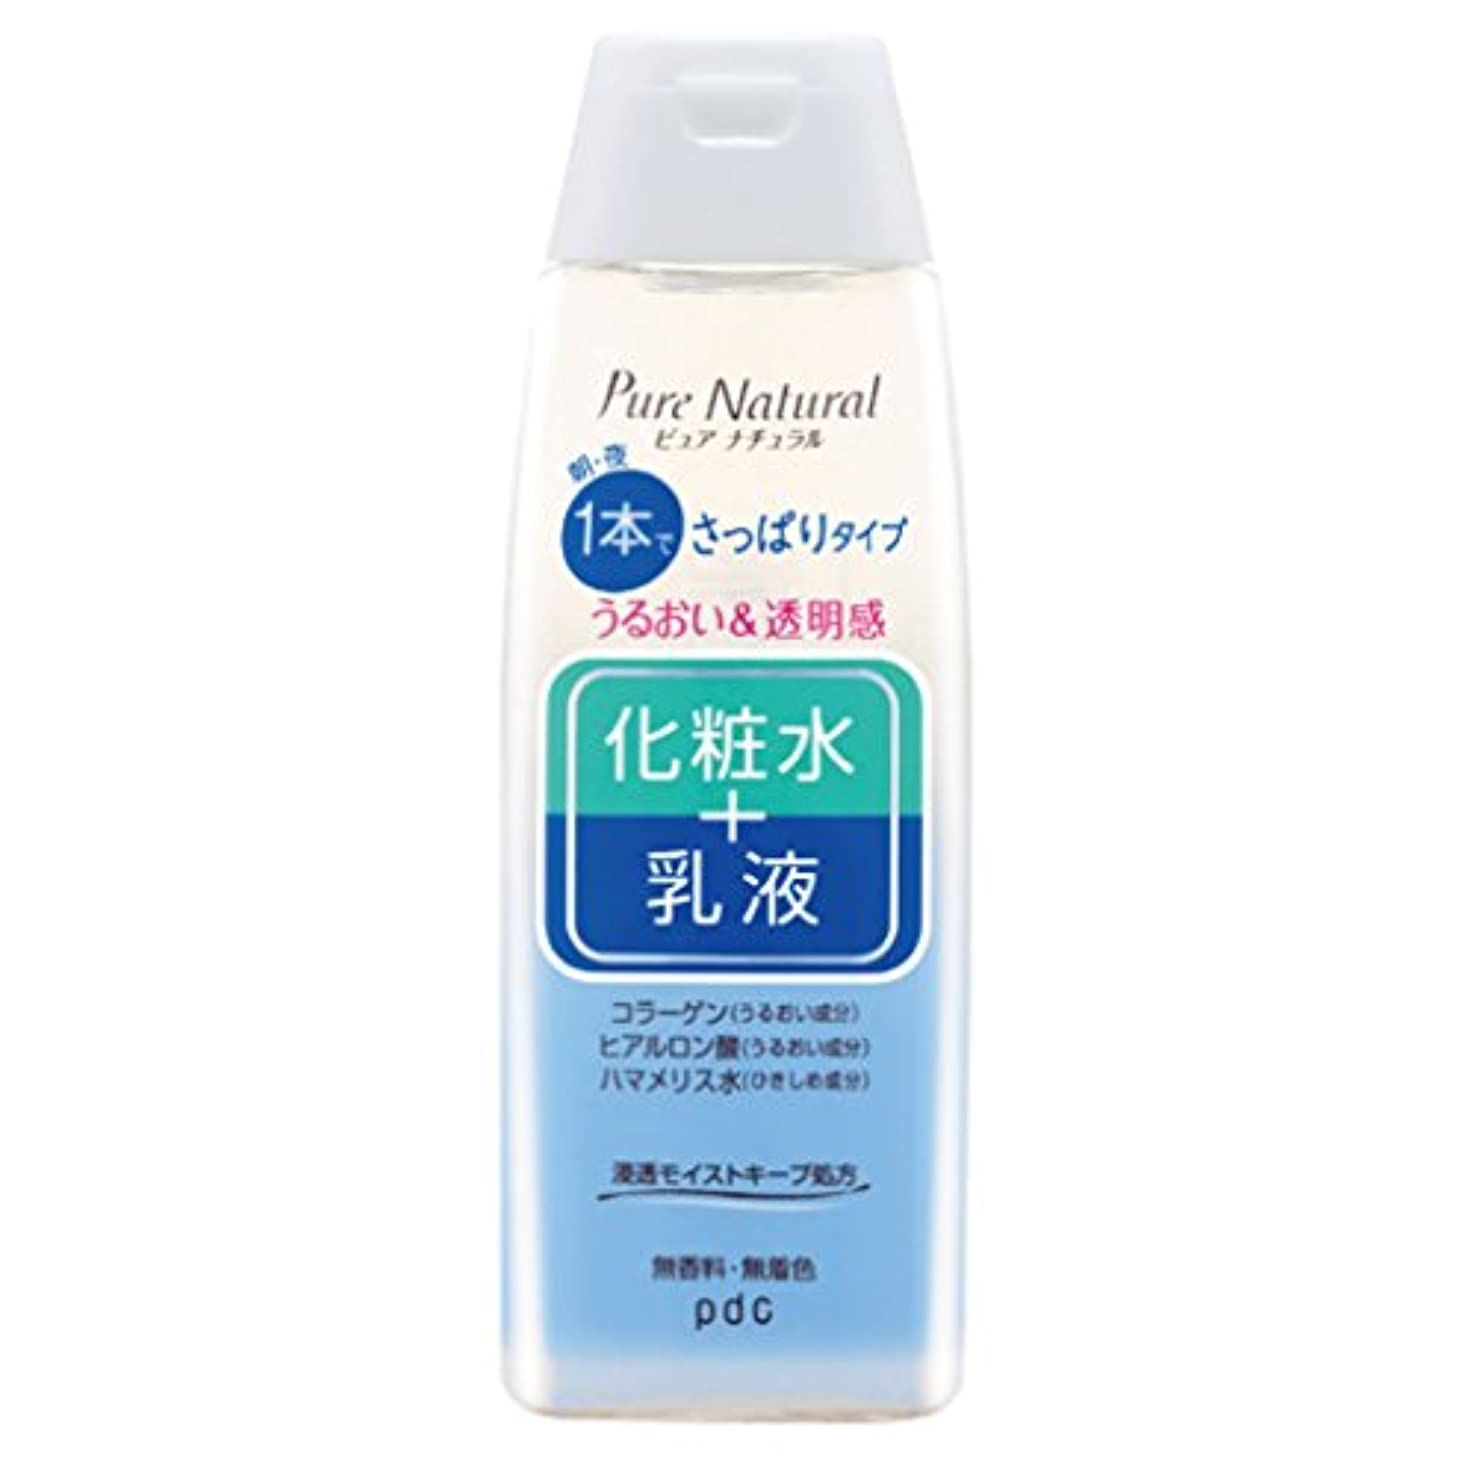 Pure NATURAL(ピュアナチュラル) エッセンスローションライト 210ml